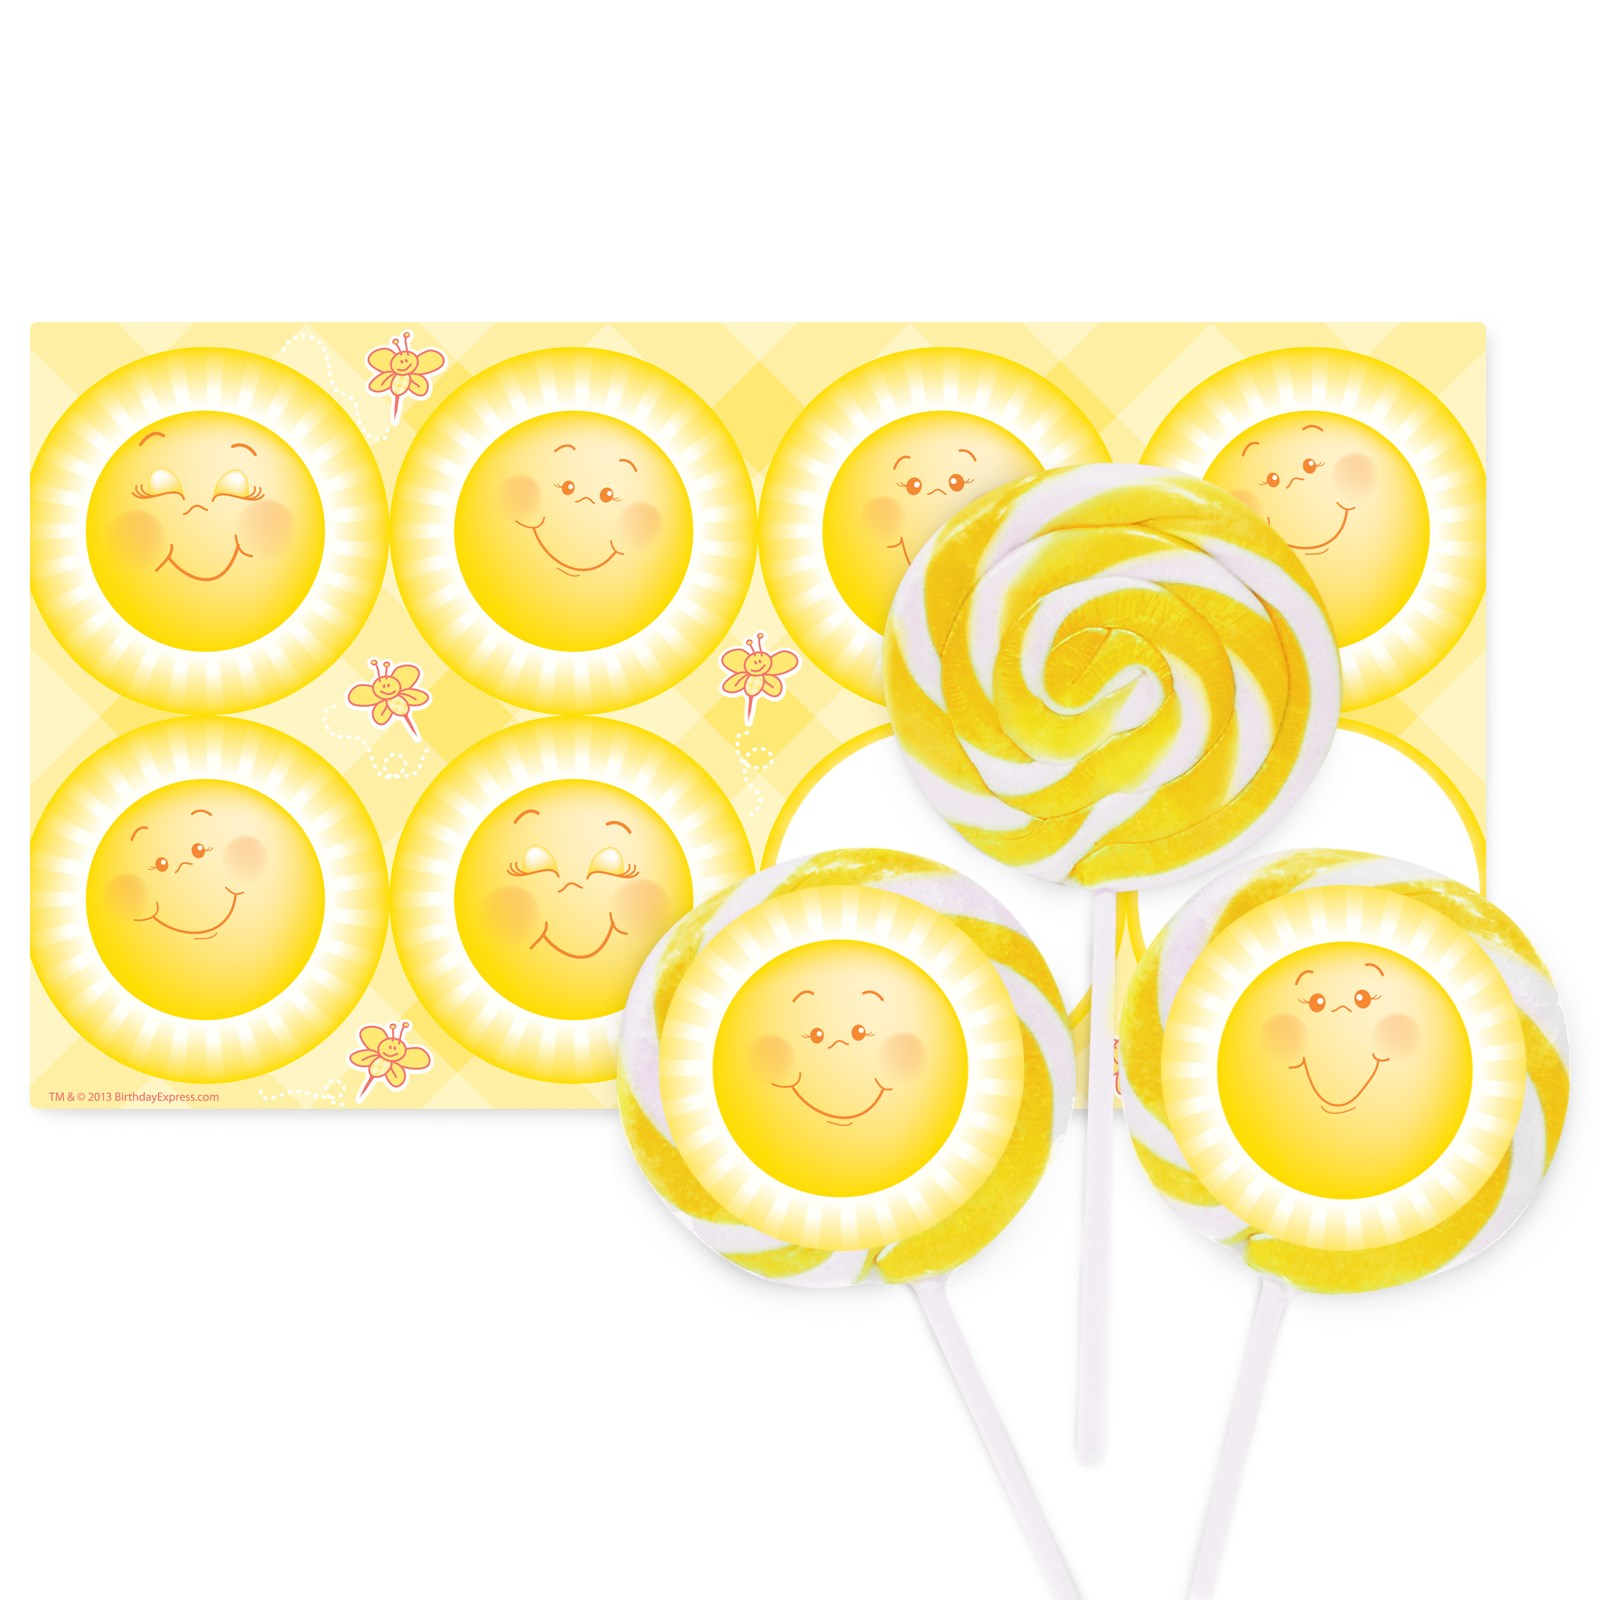 Image of Little Sunshine Party Large Lollipop Sticker Kit